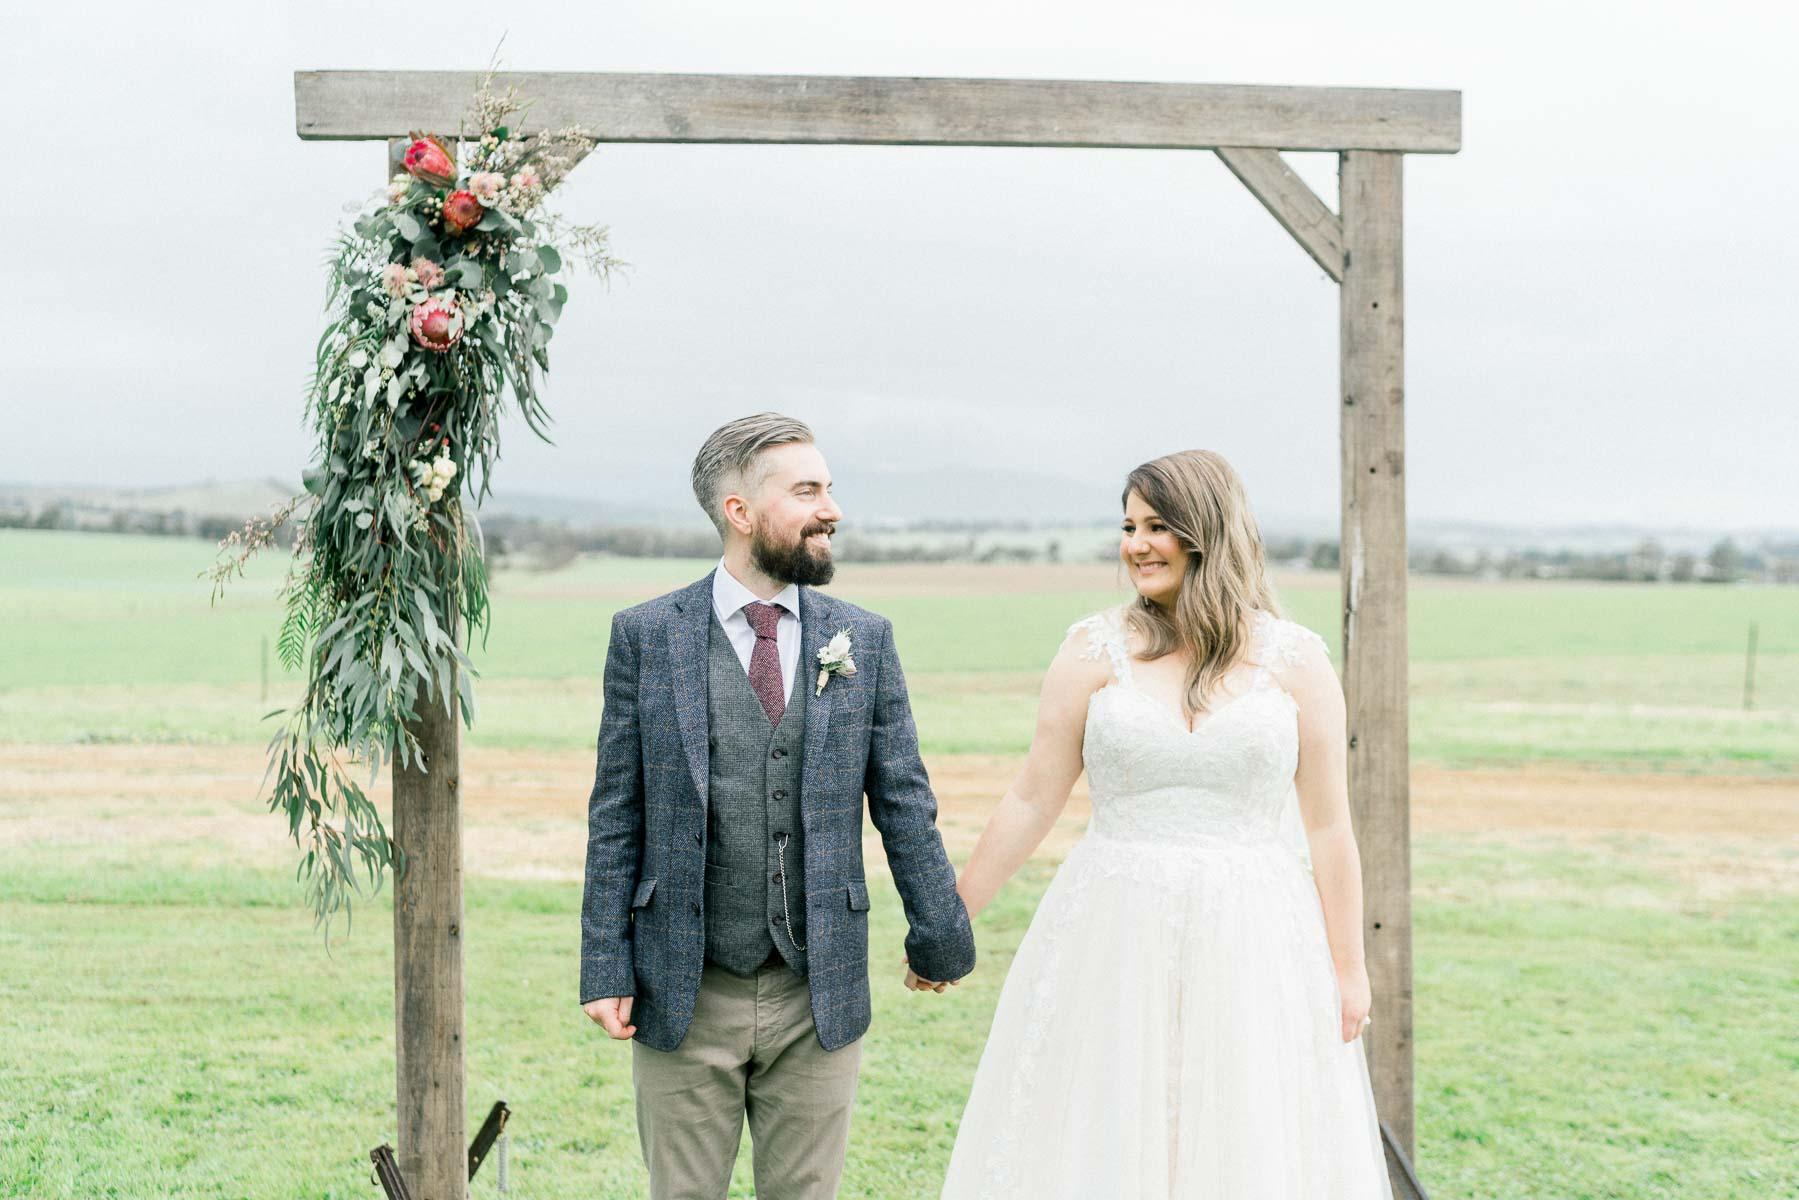 adams-farm-coldstream-yarra-valley-wedding-heart+soul-weddings-kel-jarryd-05281.jpg